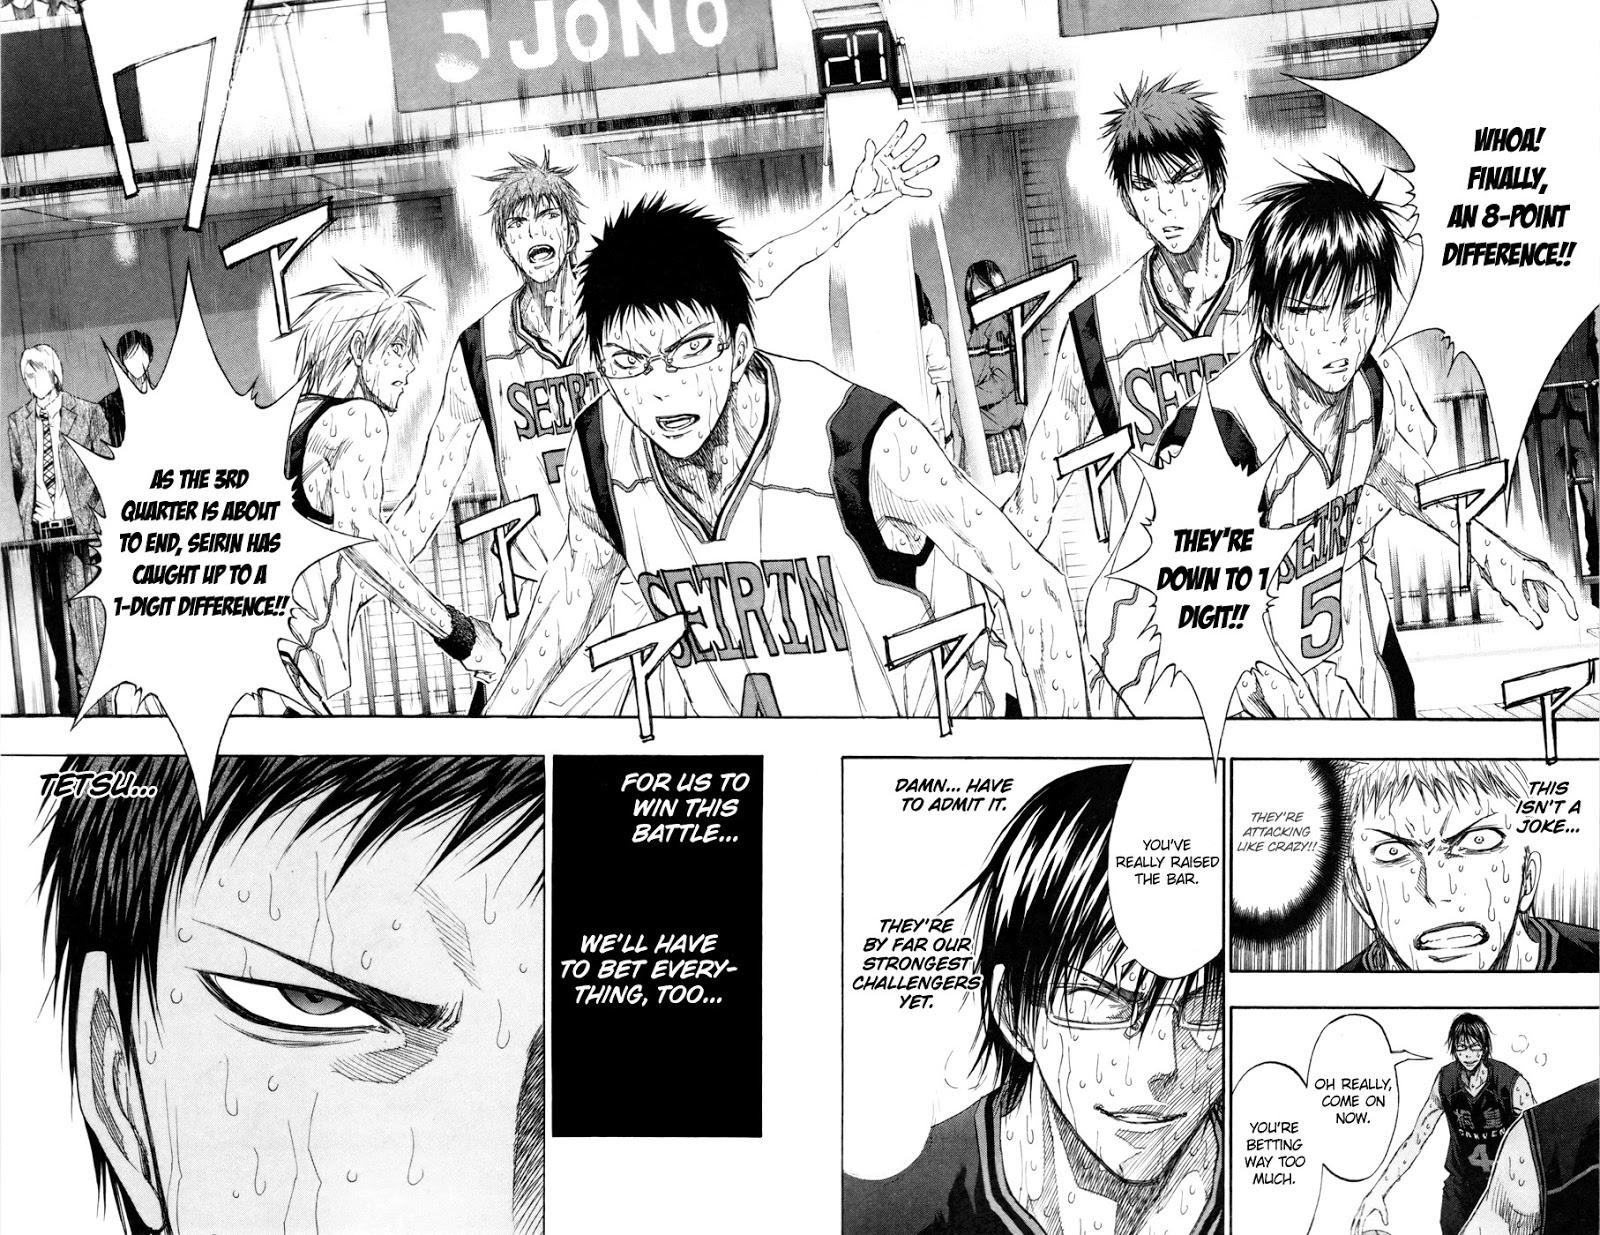 Kuroko no Basket Manga Chapter 129 - Image 17-17